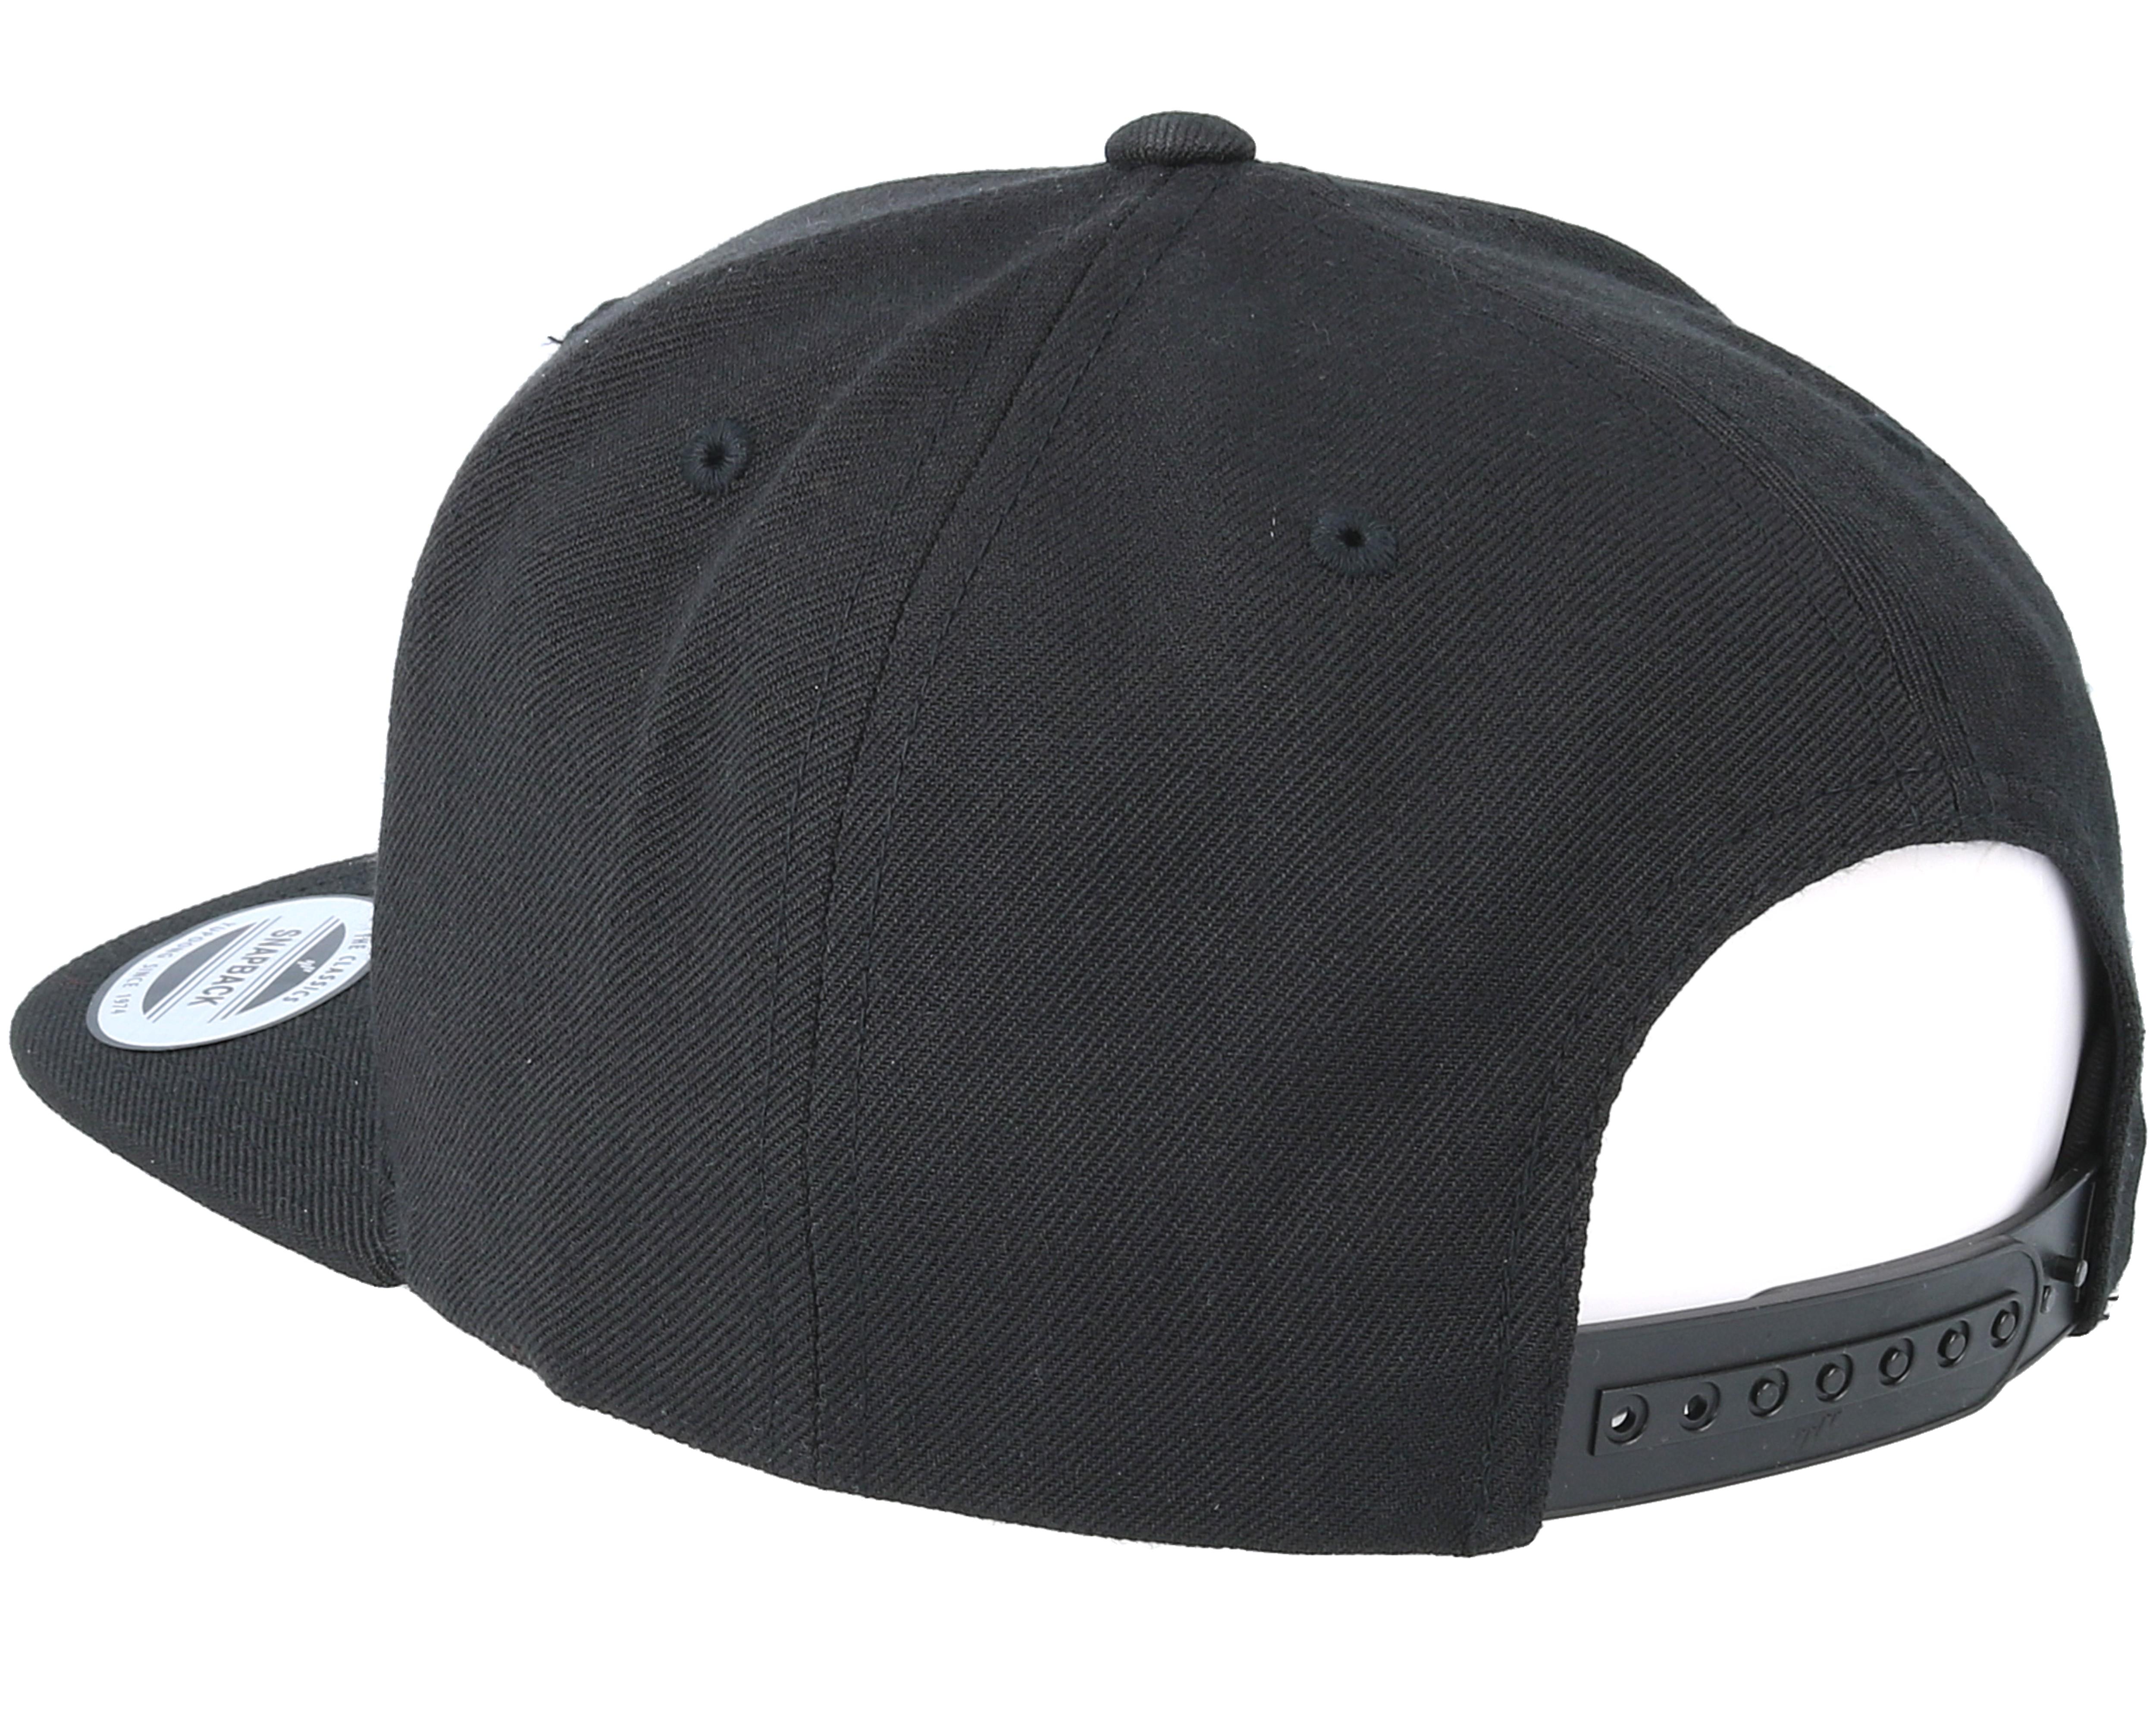 Pizza Time Black Snapback Boom Caps Hatstore Co Uk